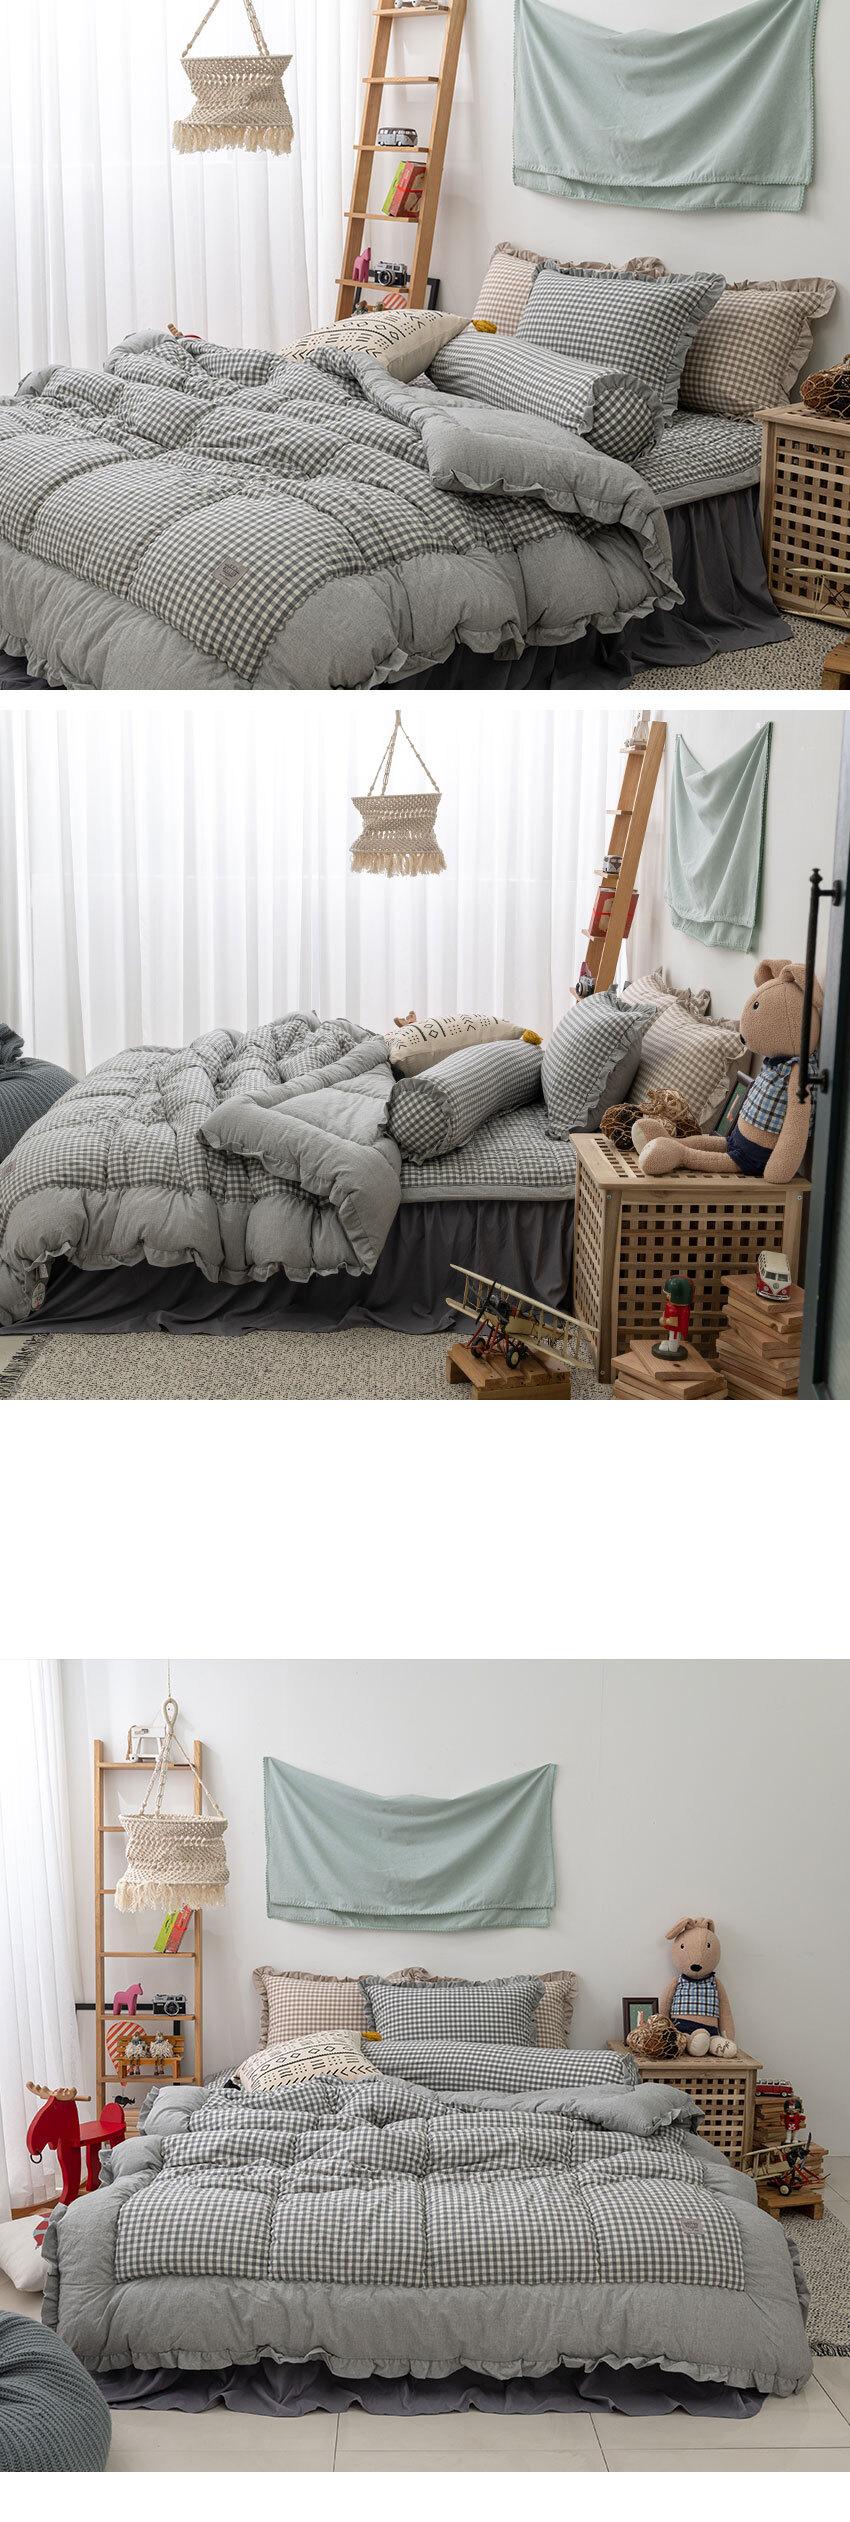 frillcheck_bed_gray02.jpg